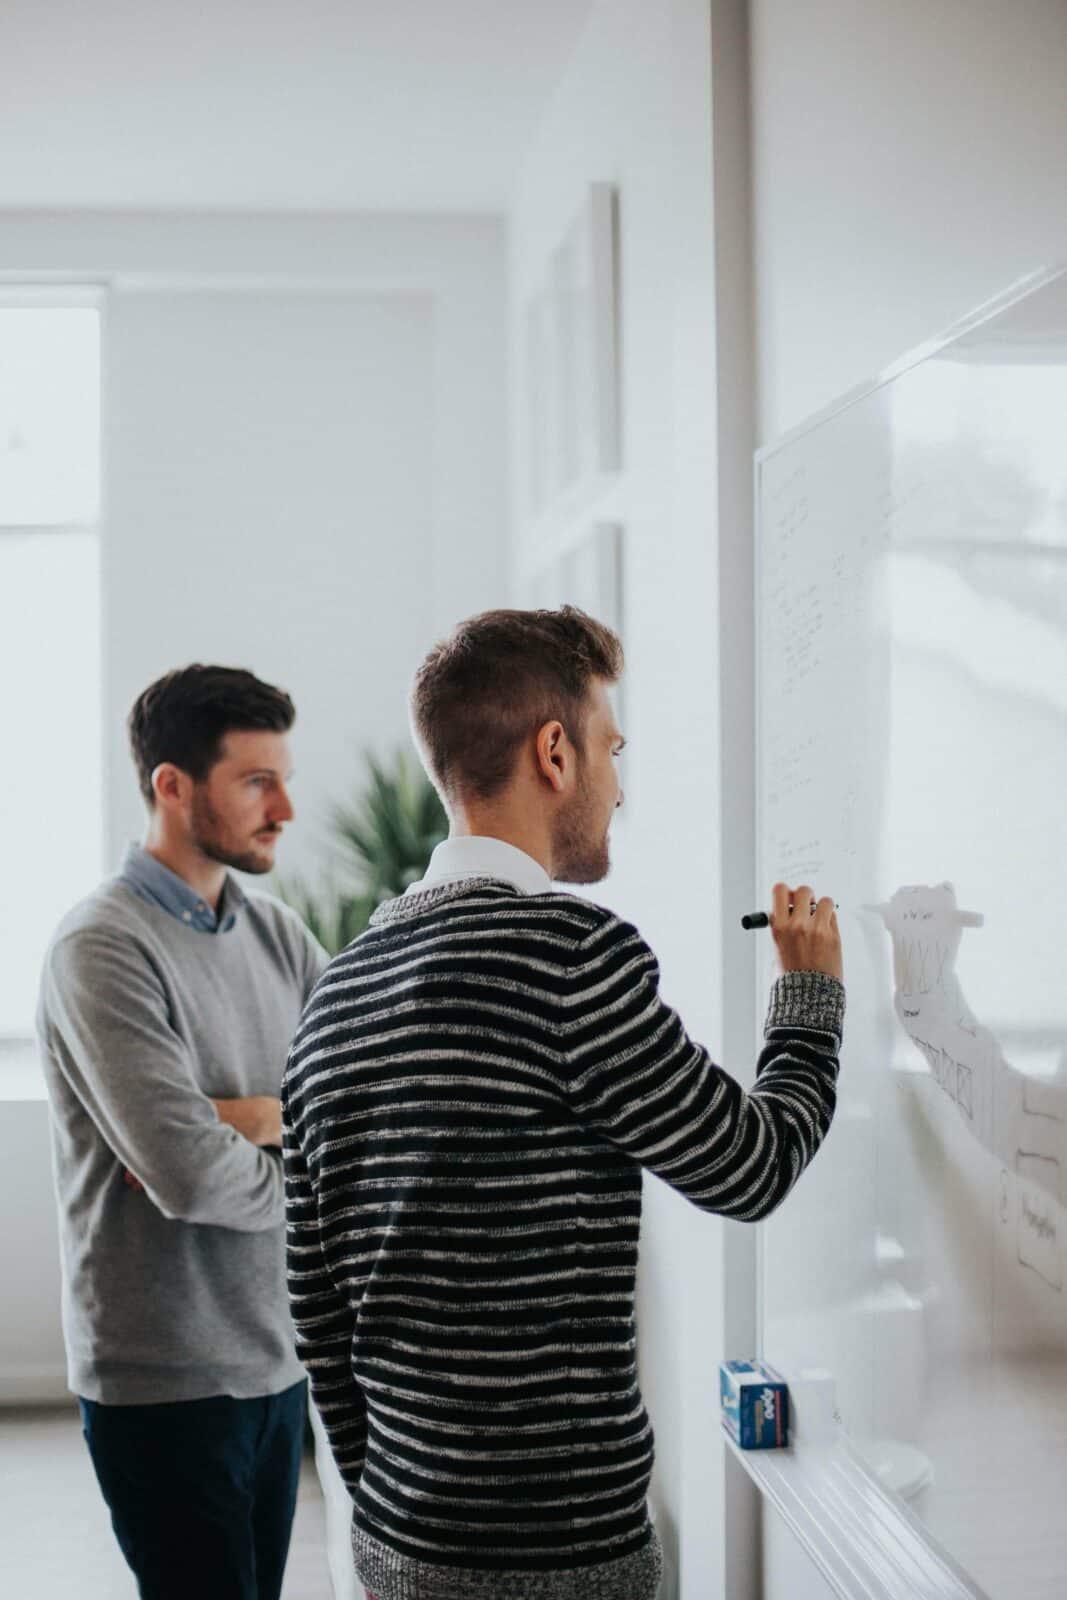 2 teammates writing a digital marketing strategy on a whiteboard